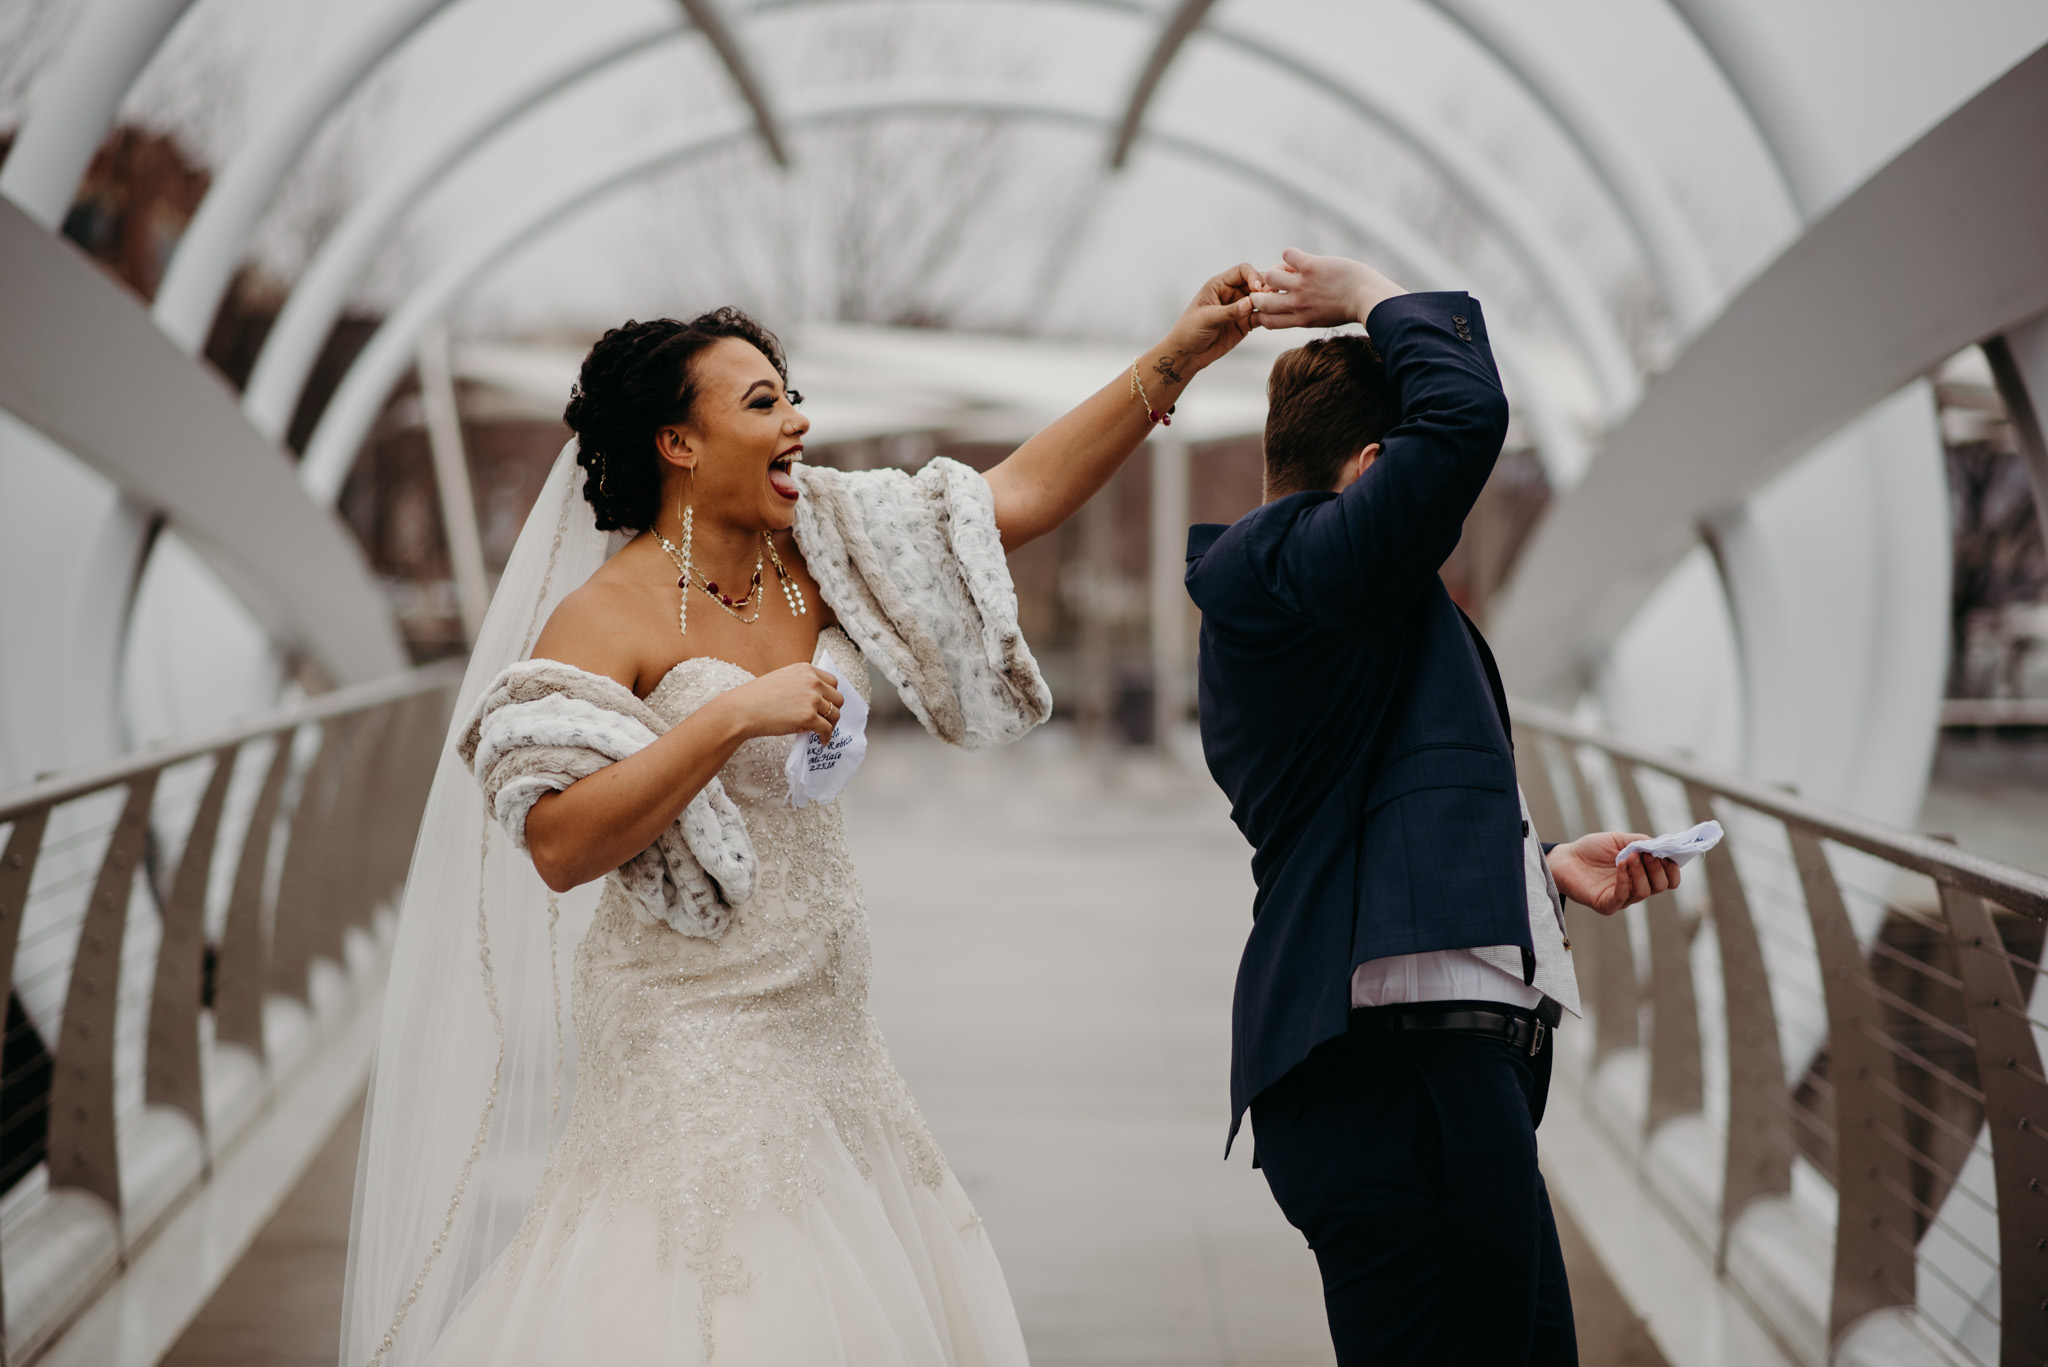 district-winery-lgbtq-lgbt-wedding-dc-lindsey-paradiso-photography-2277.jpg